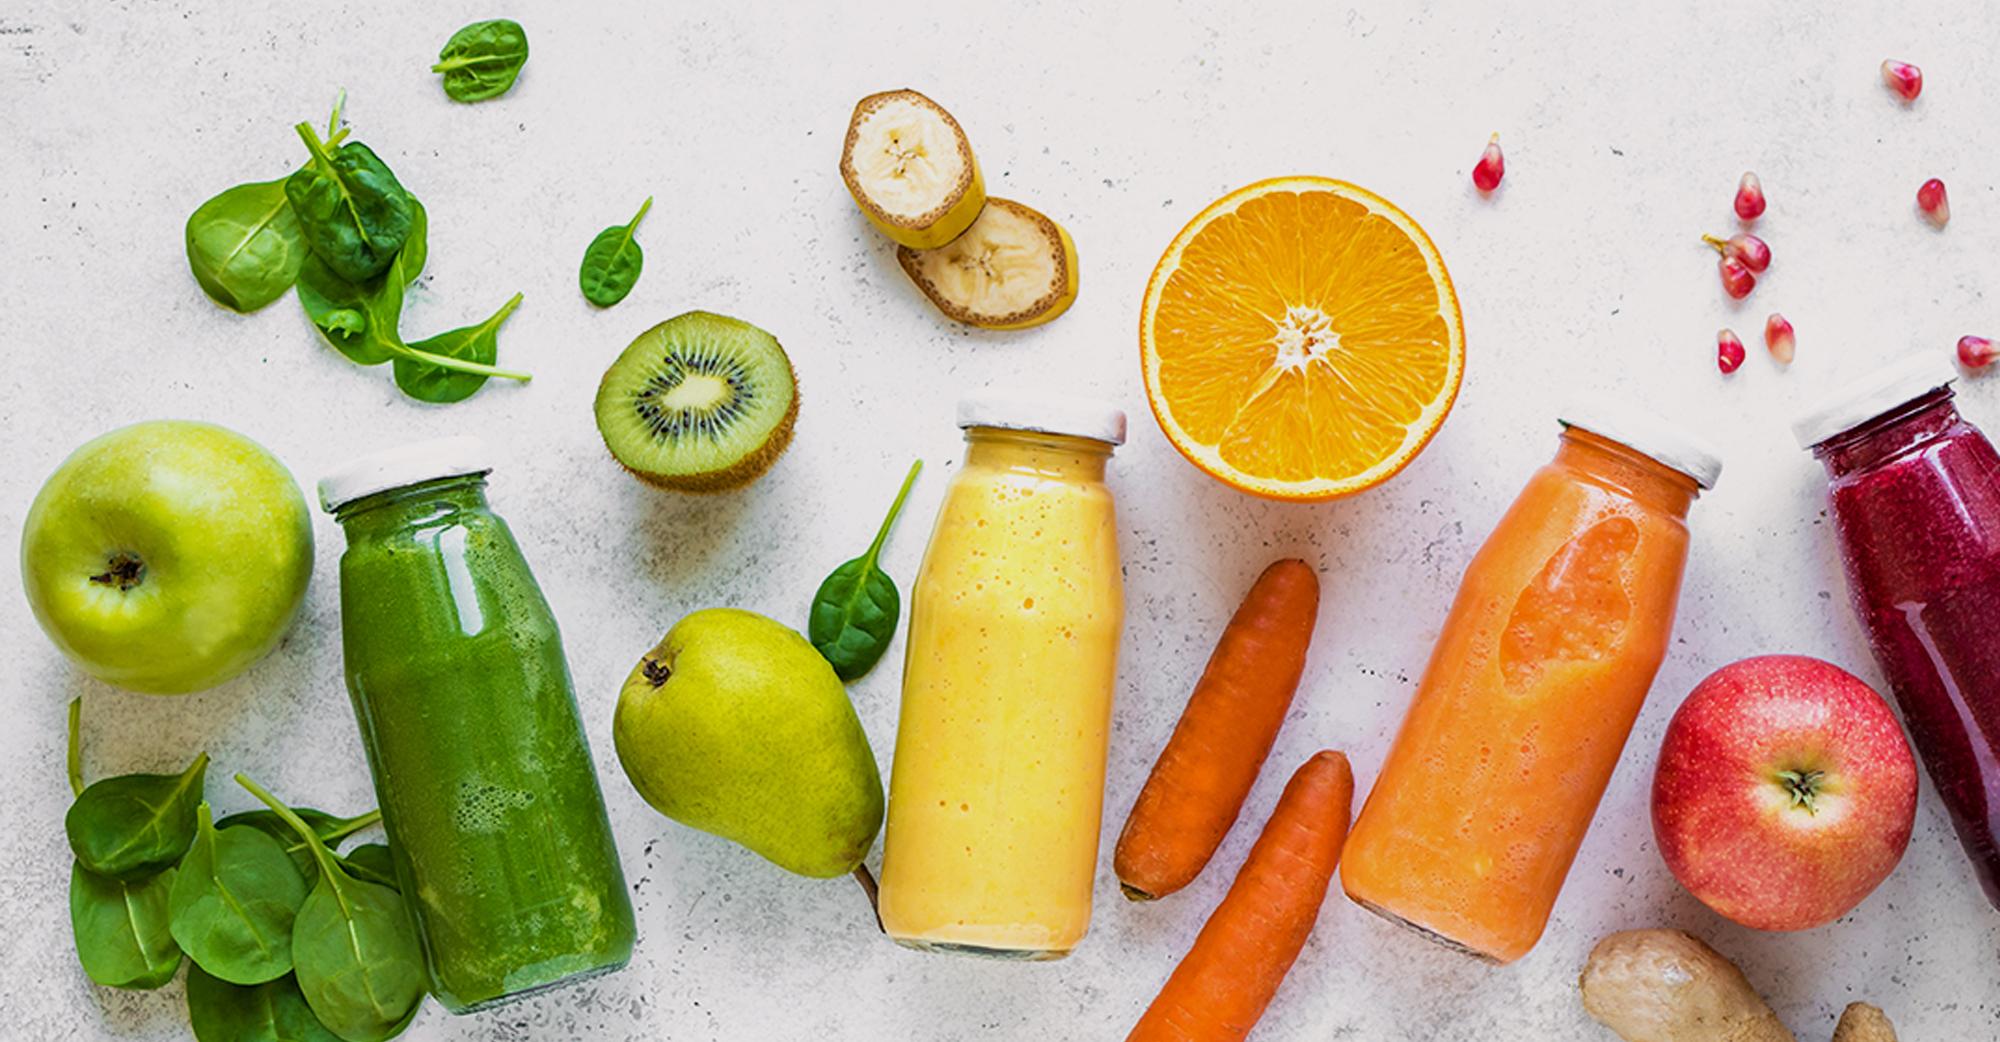 Una pausa pranzo light e nutriente